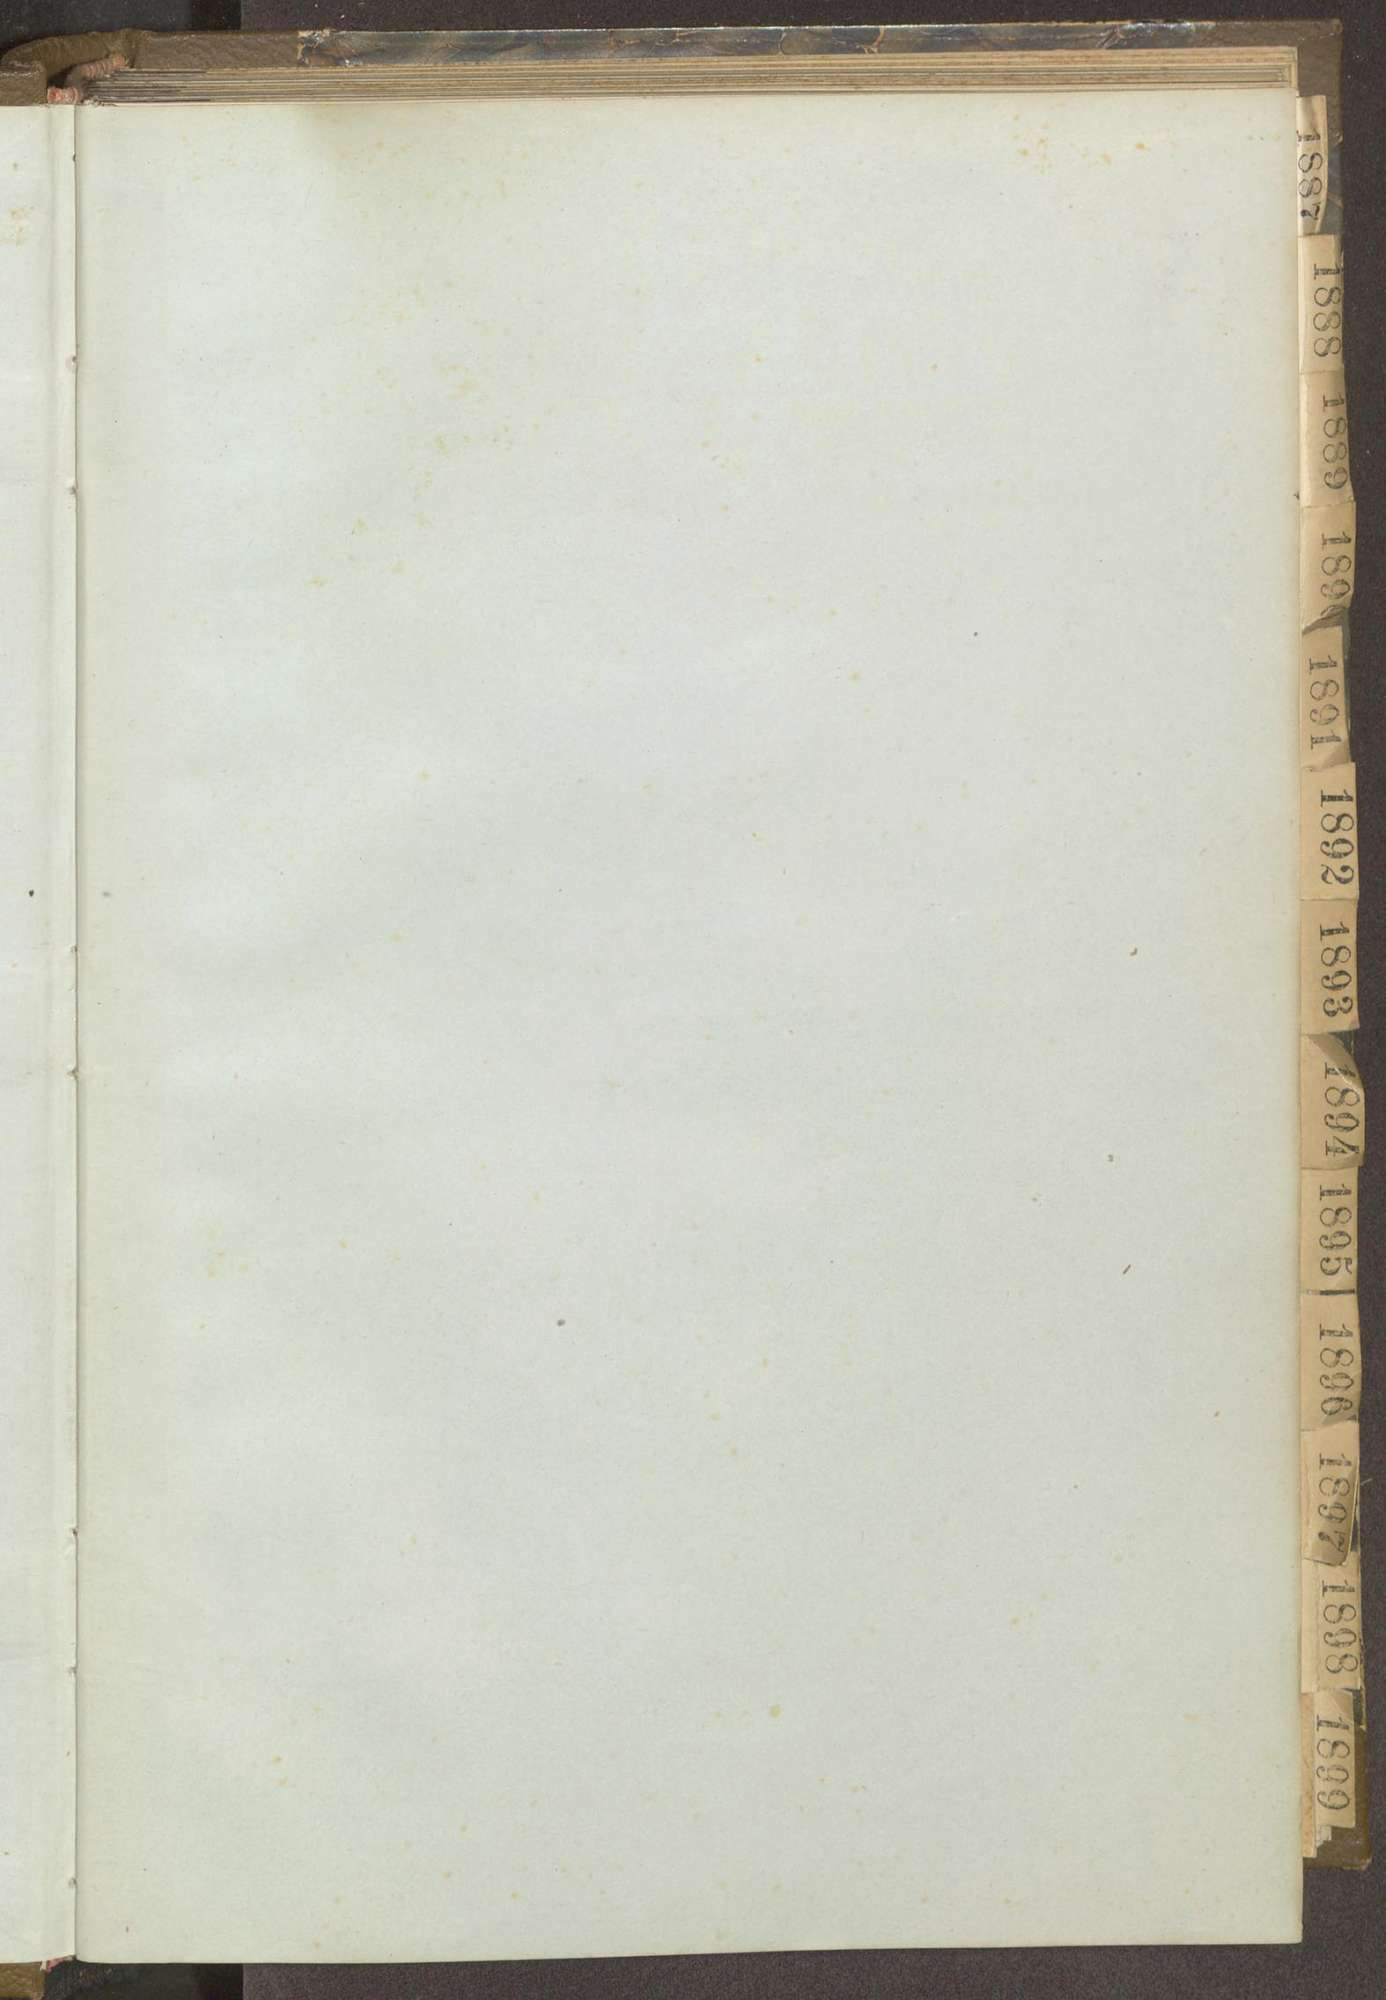 Geburtenregister Oberschmeien, Bild 3